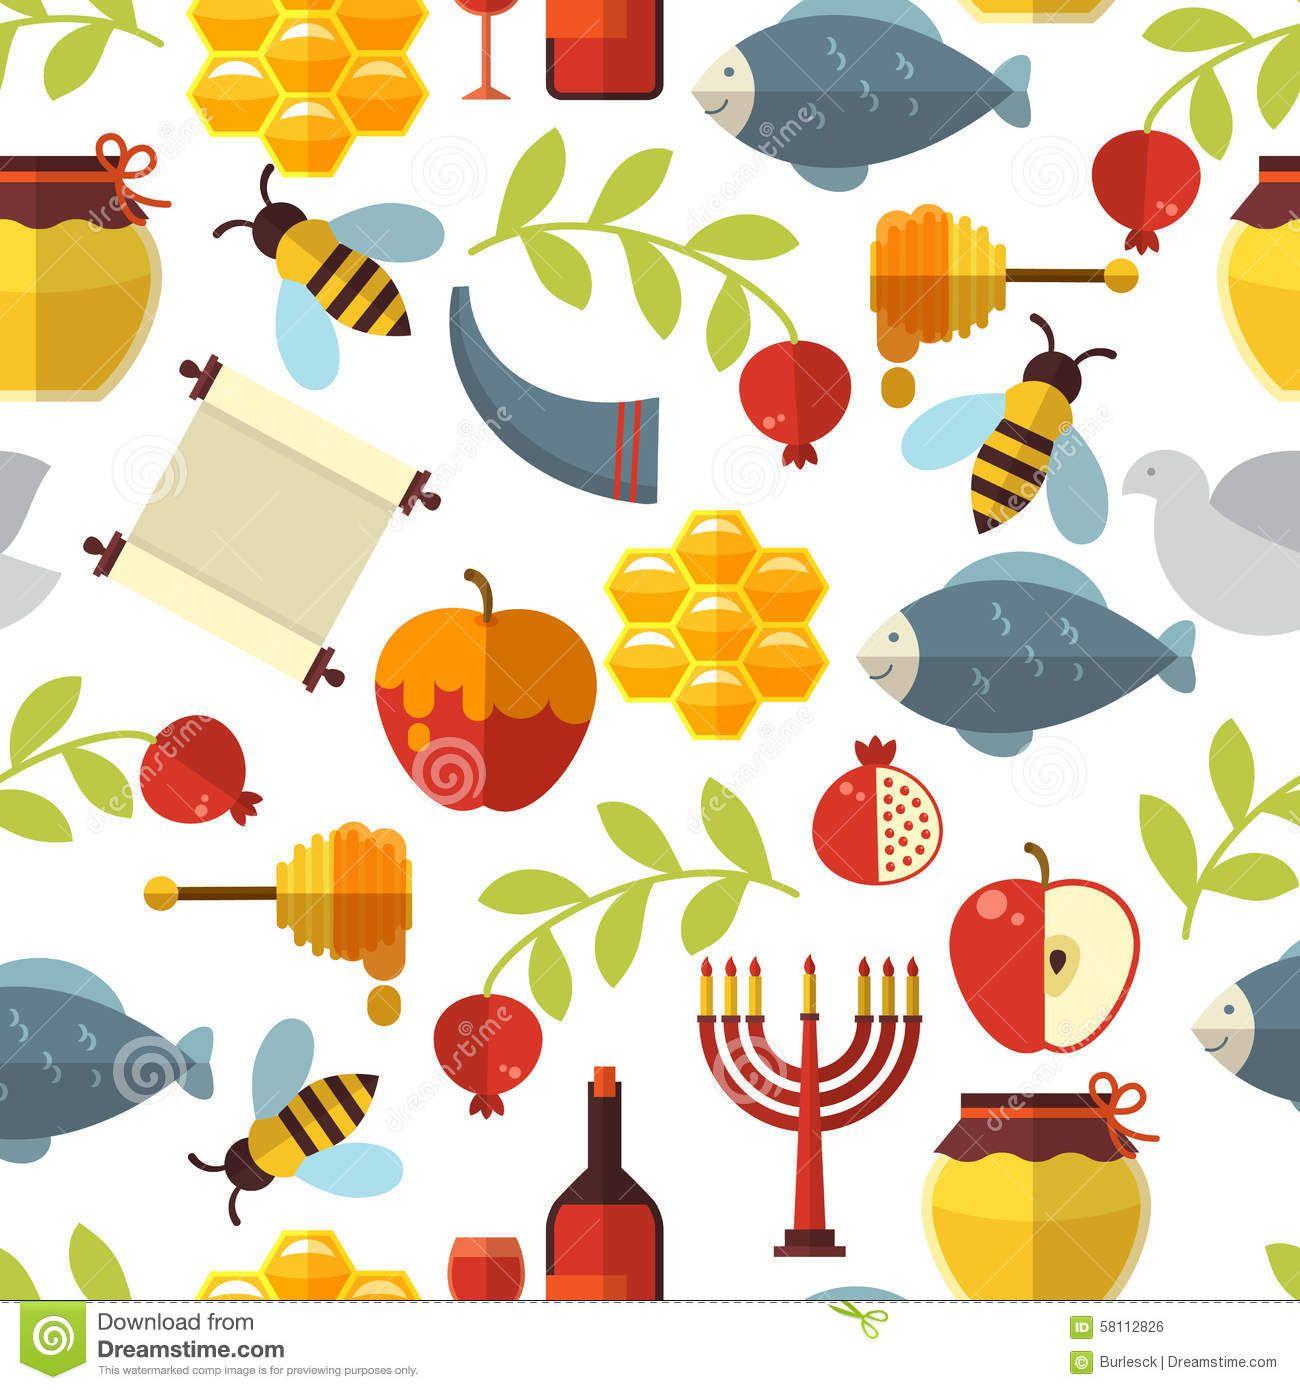 rosh hashanah children's decorations Google Search